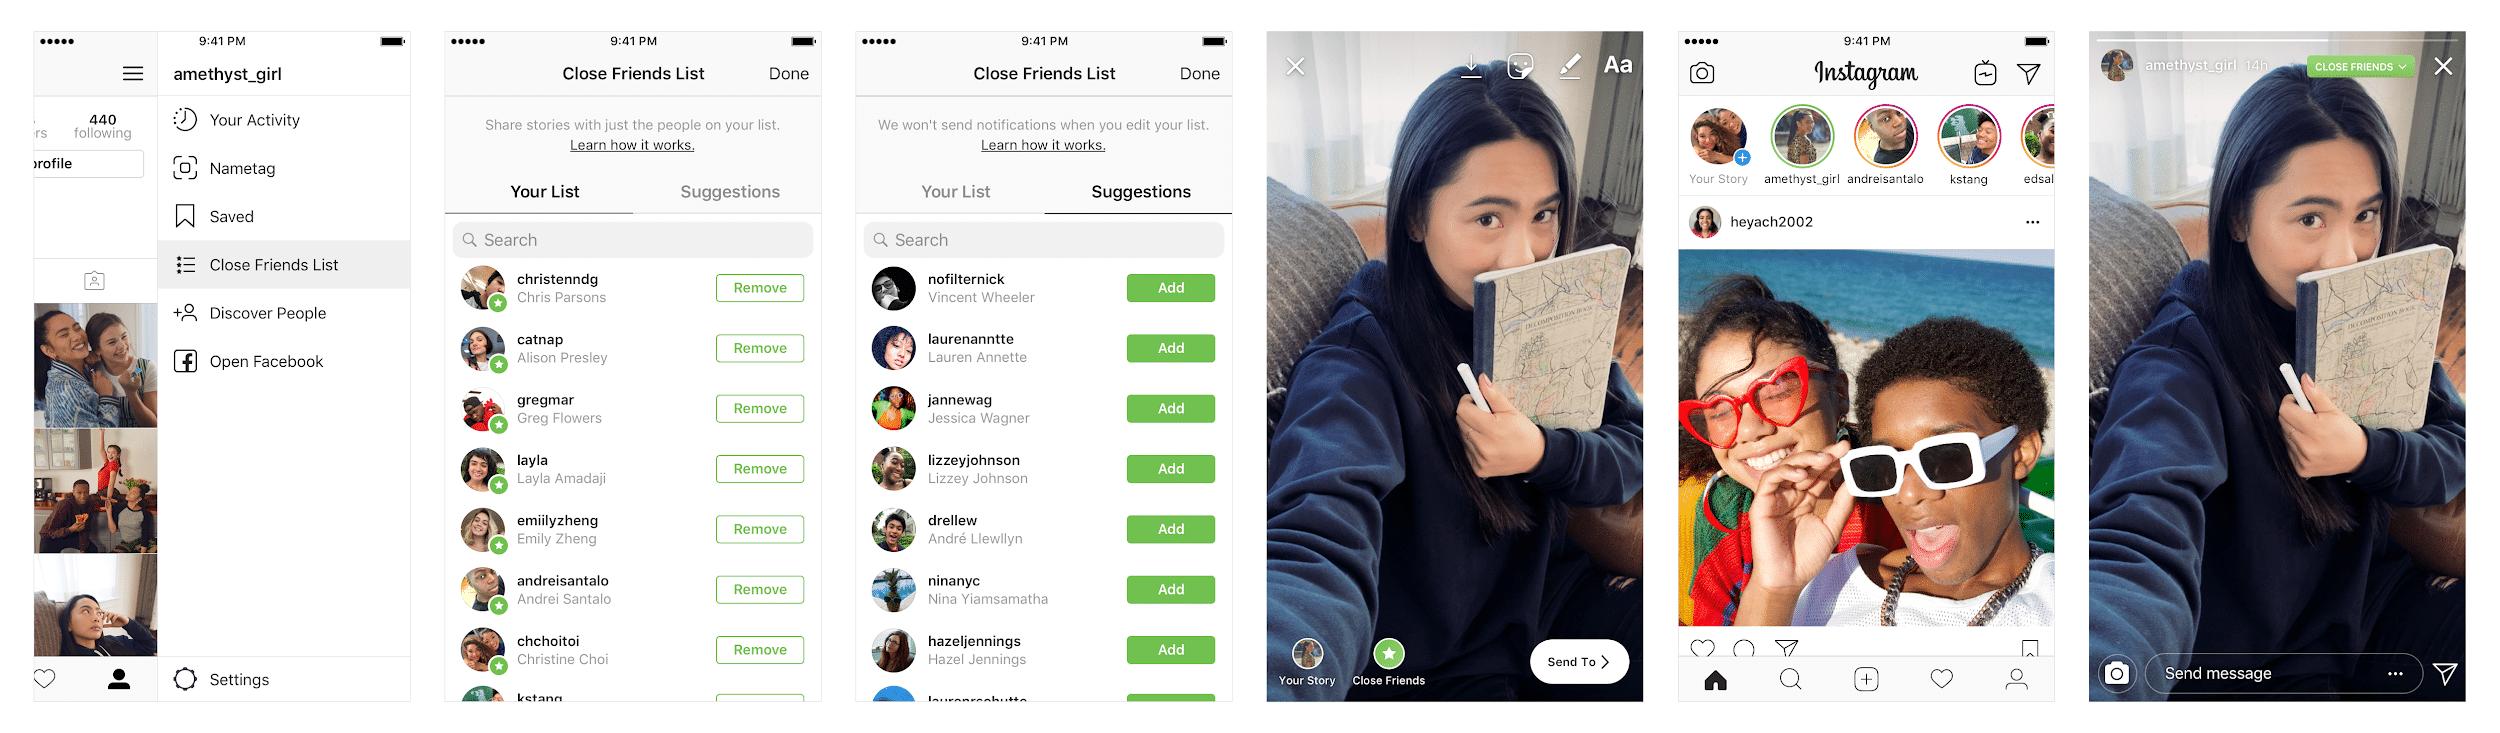 20 instagram story hacks